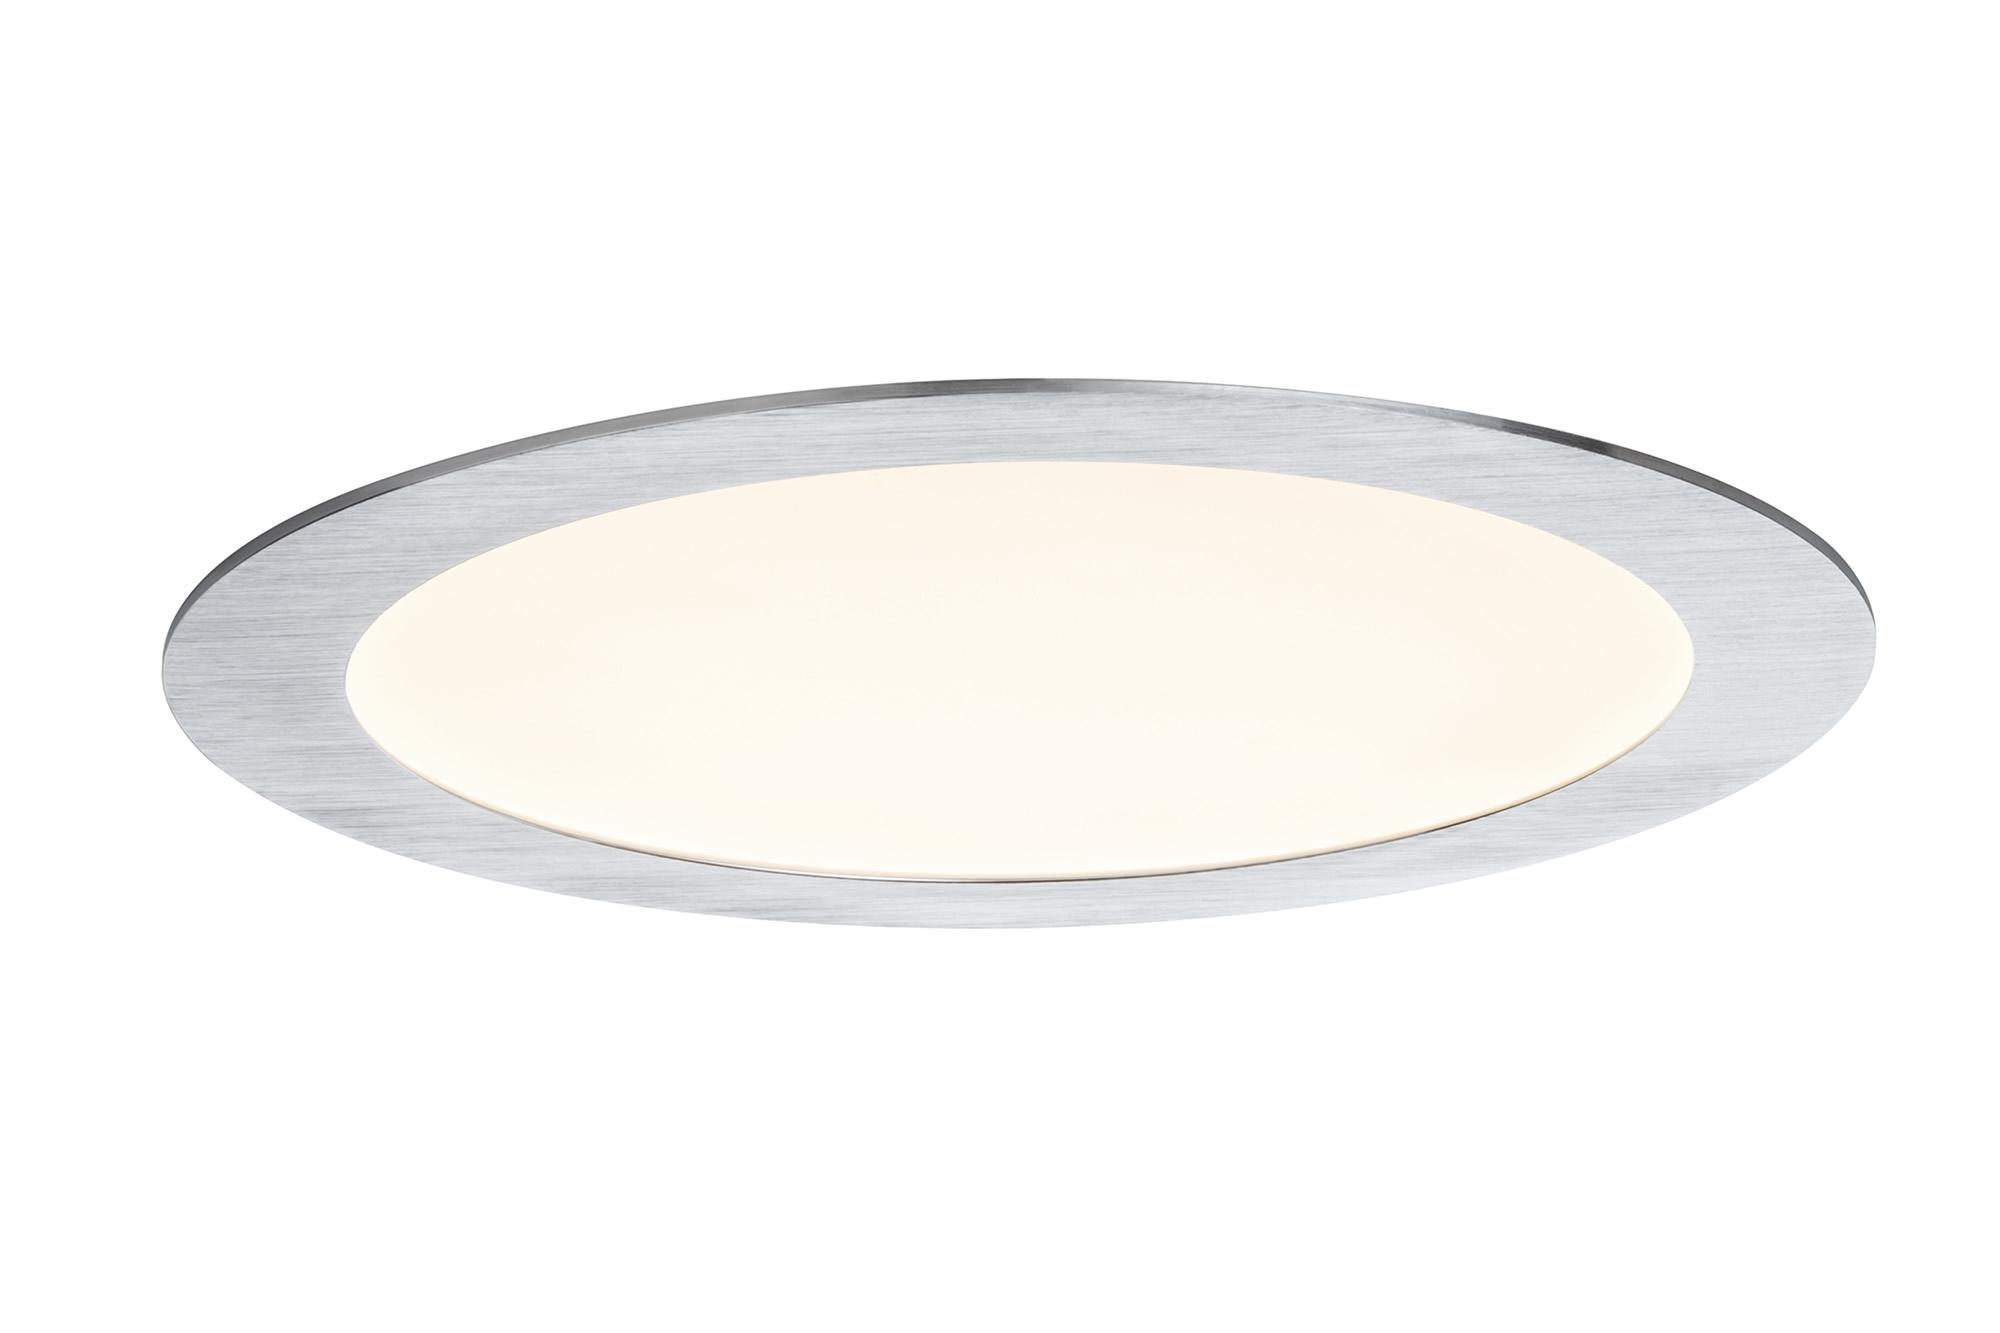 92719 Premium EBL Panel ? LED 1x15W Al-g The Premium LED recessed panel provides optimum light distribution and is highly versatile thanks to its flat installation depth. 927.19 Recessed panel Premium Line 13 W LED brushed aluminium Warm white, round, 1-pc. set Paulmann